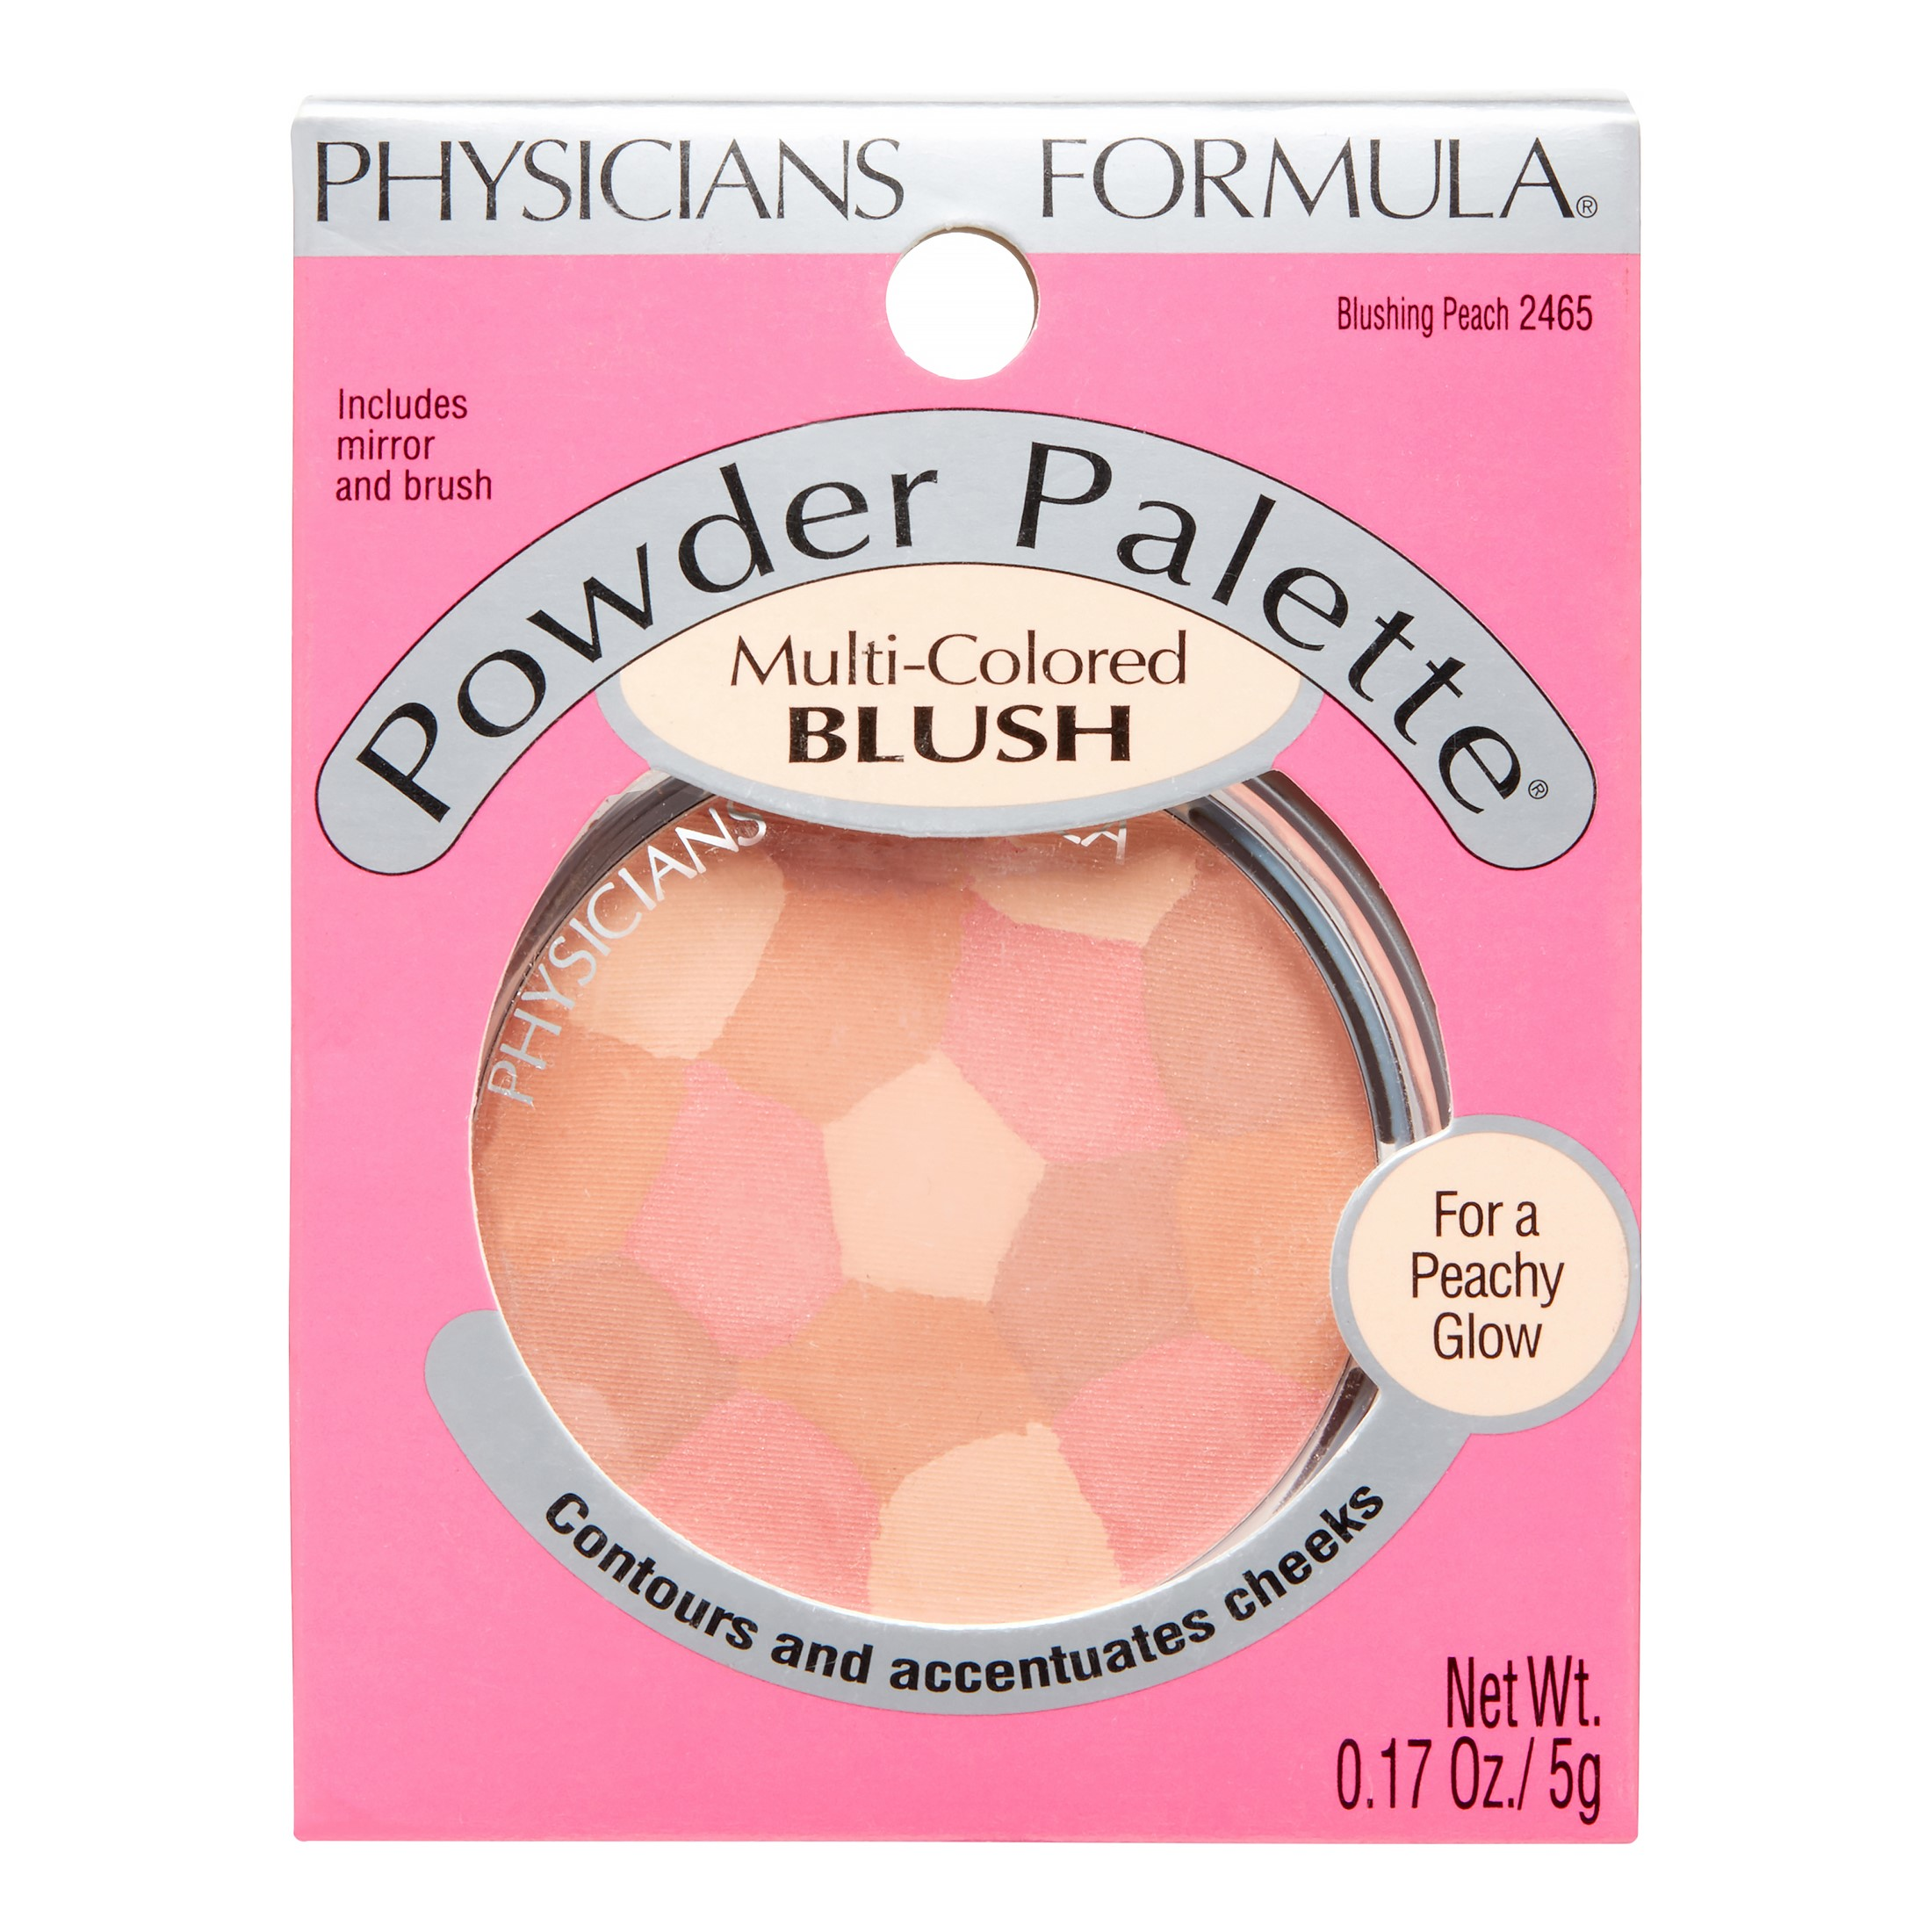 Physicians Formula Powder Palette Blush - Blushing Peach